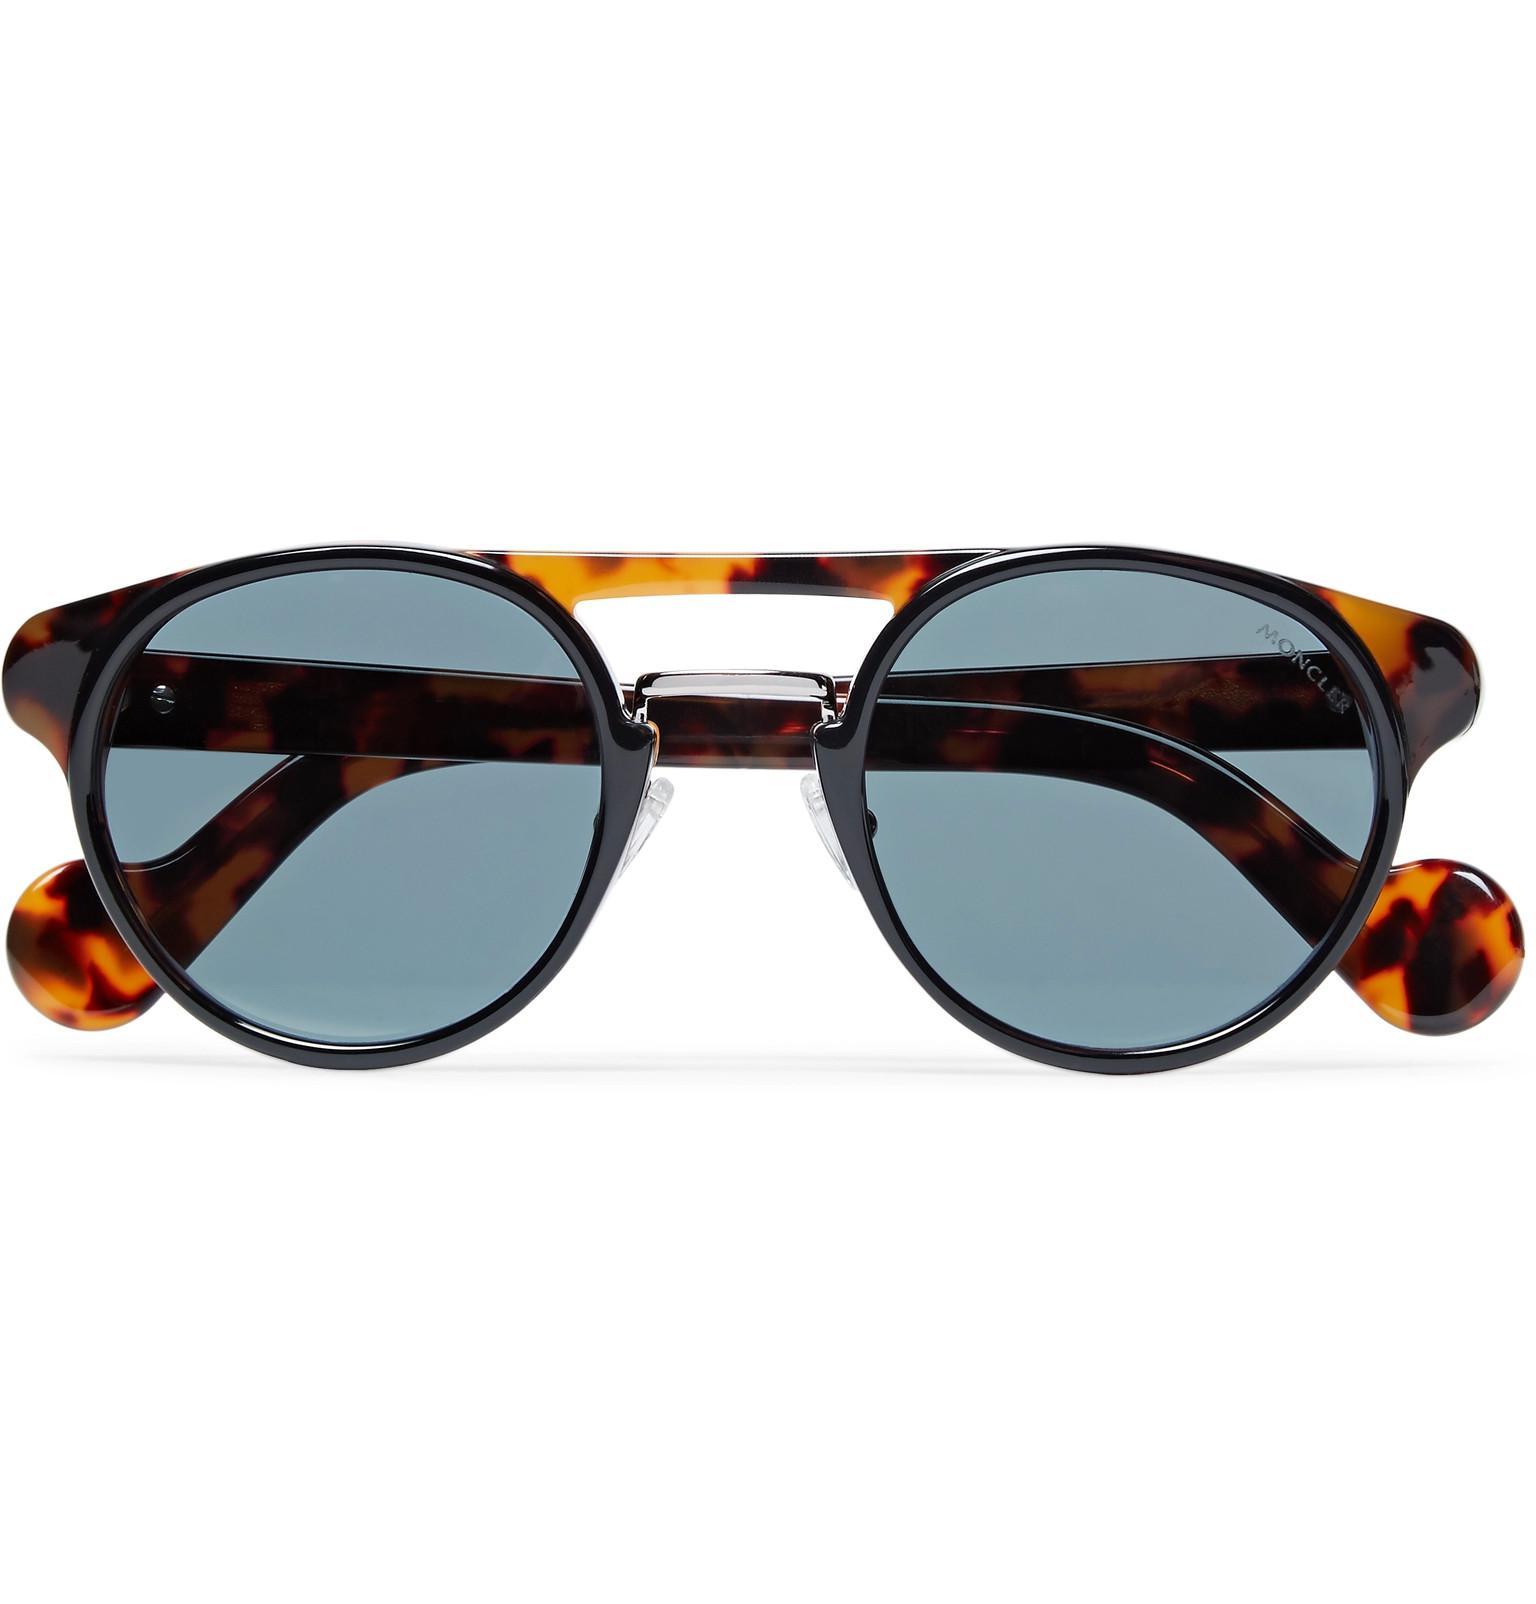 Moncler Round-frame Gold-tone And Tortoiseshell Acetate Sunglasses - Gold HQ4EvTz7